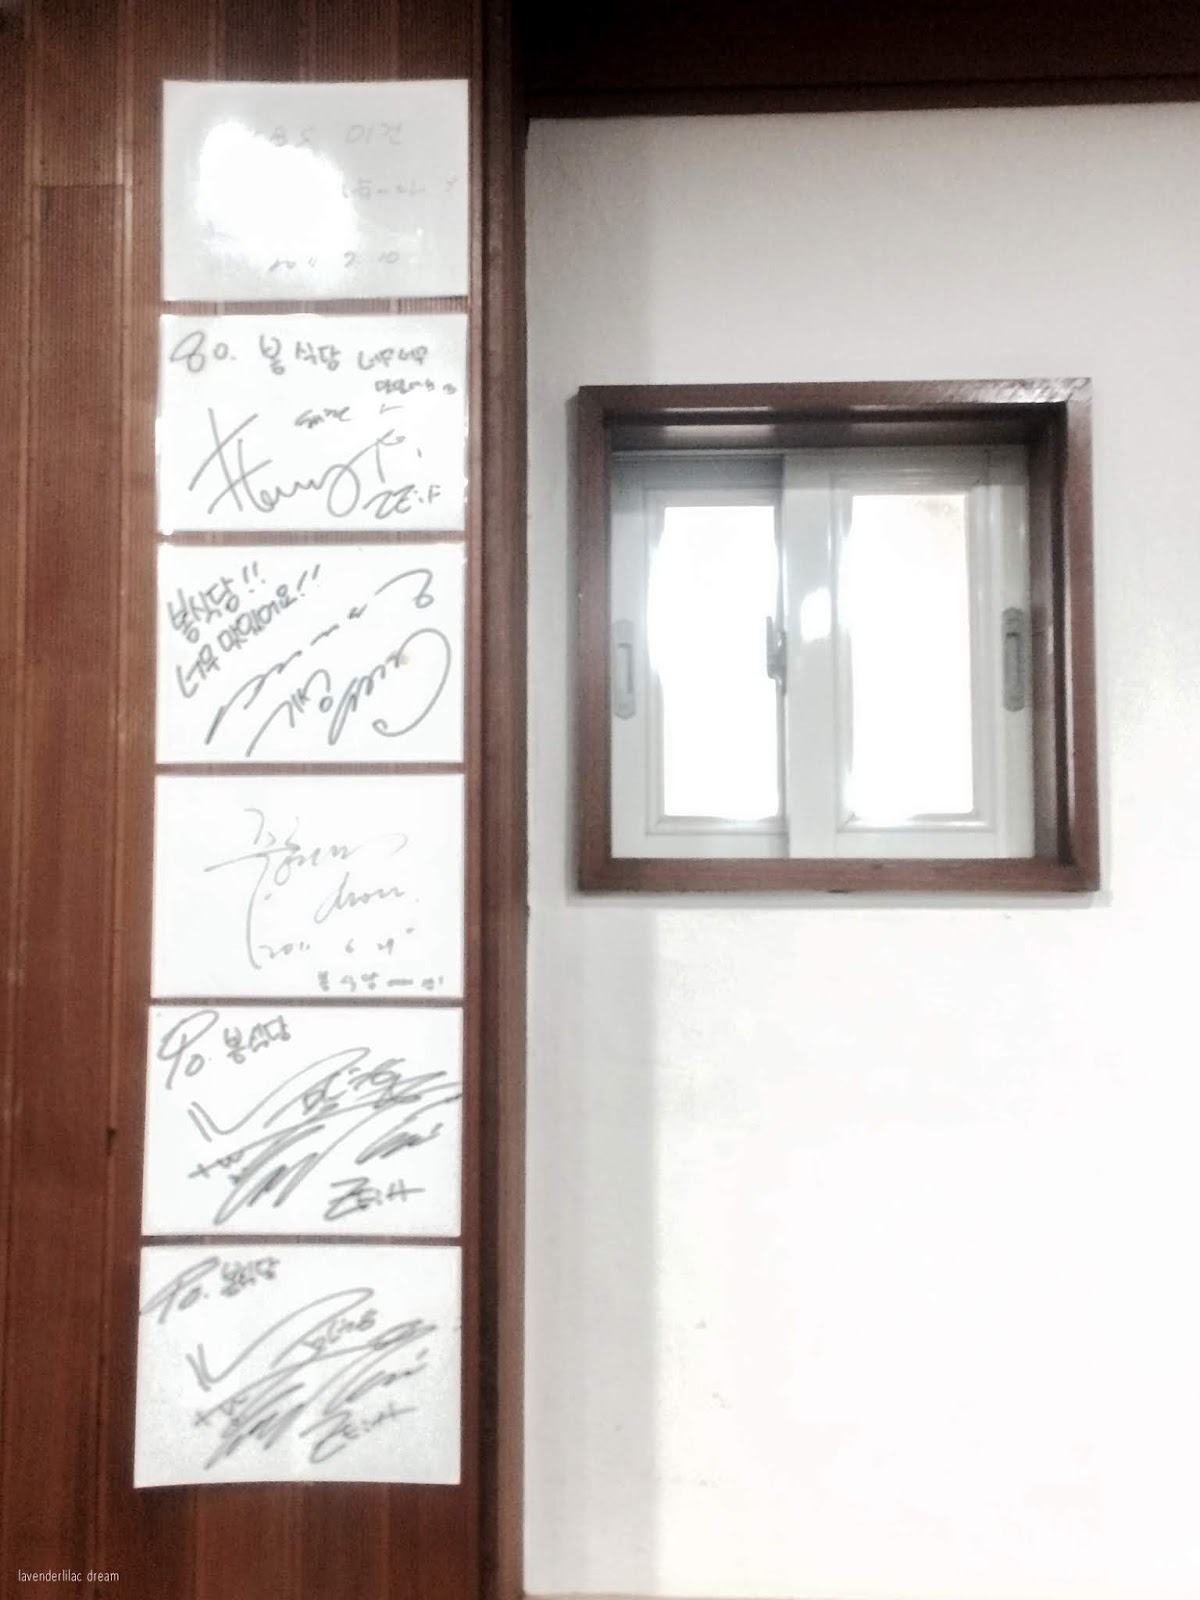 South Korea, Jeju Island, Yonsei University, YISS 2014, Samgyetang restaurant celebrity autographs